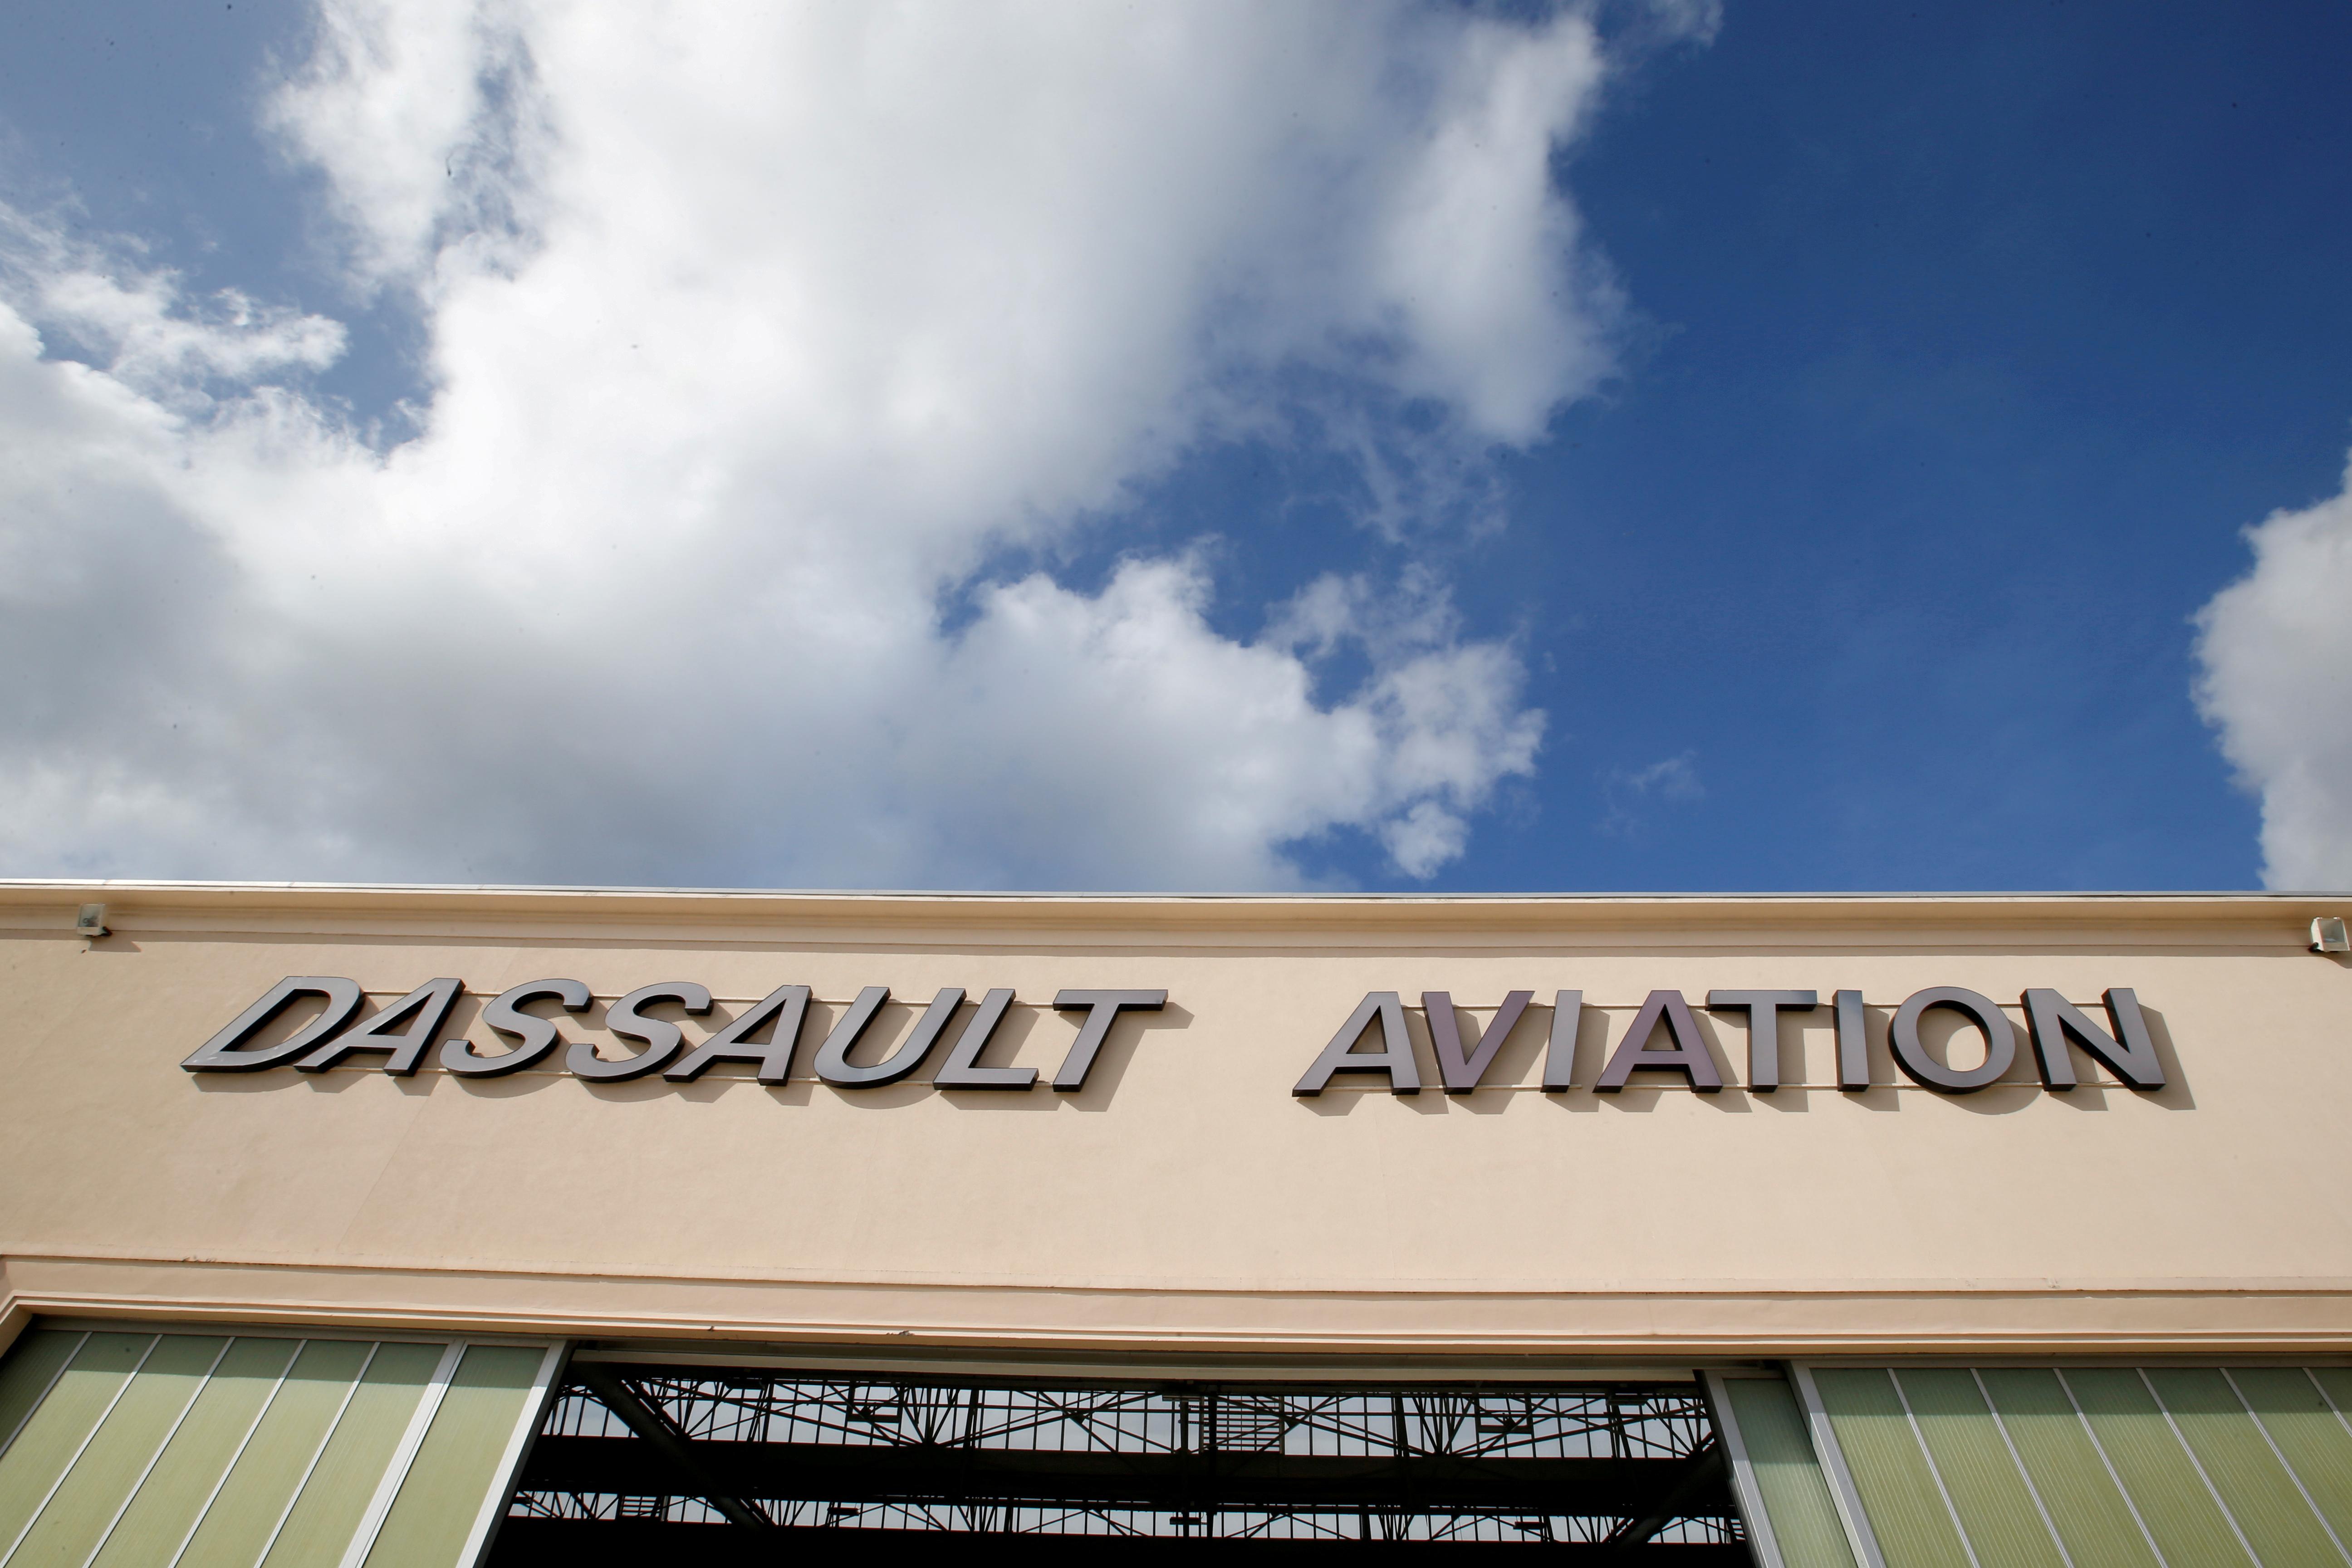 The logo of French aircraft manufacturer Dassault Aviation is seen on a hangar in Merignac near Bordeaux, France, October 8, 2019.   REUTERS/Regis Duvignau/